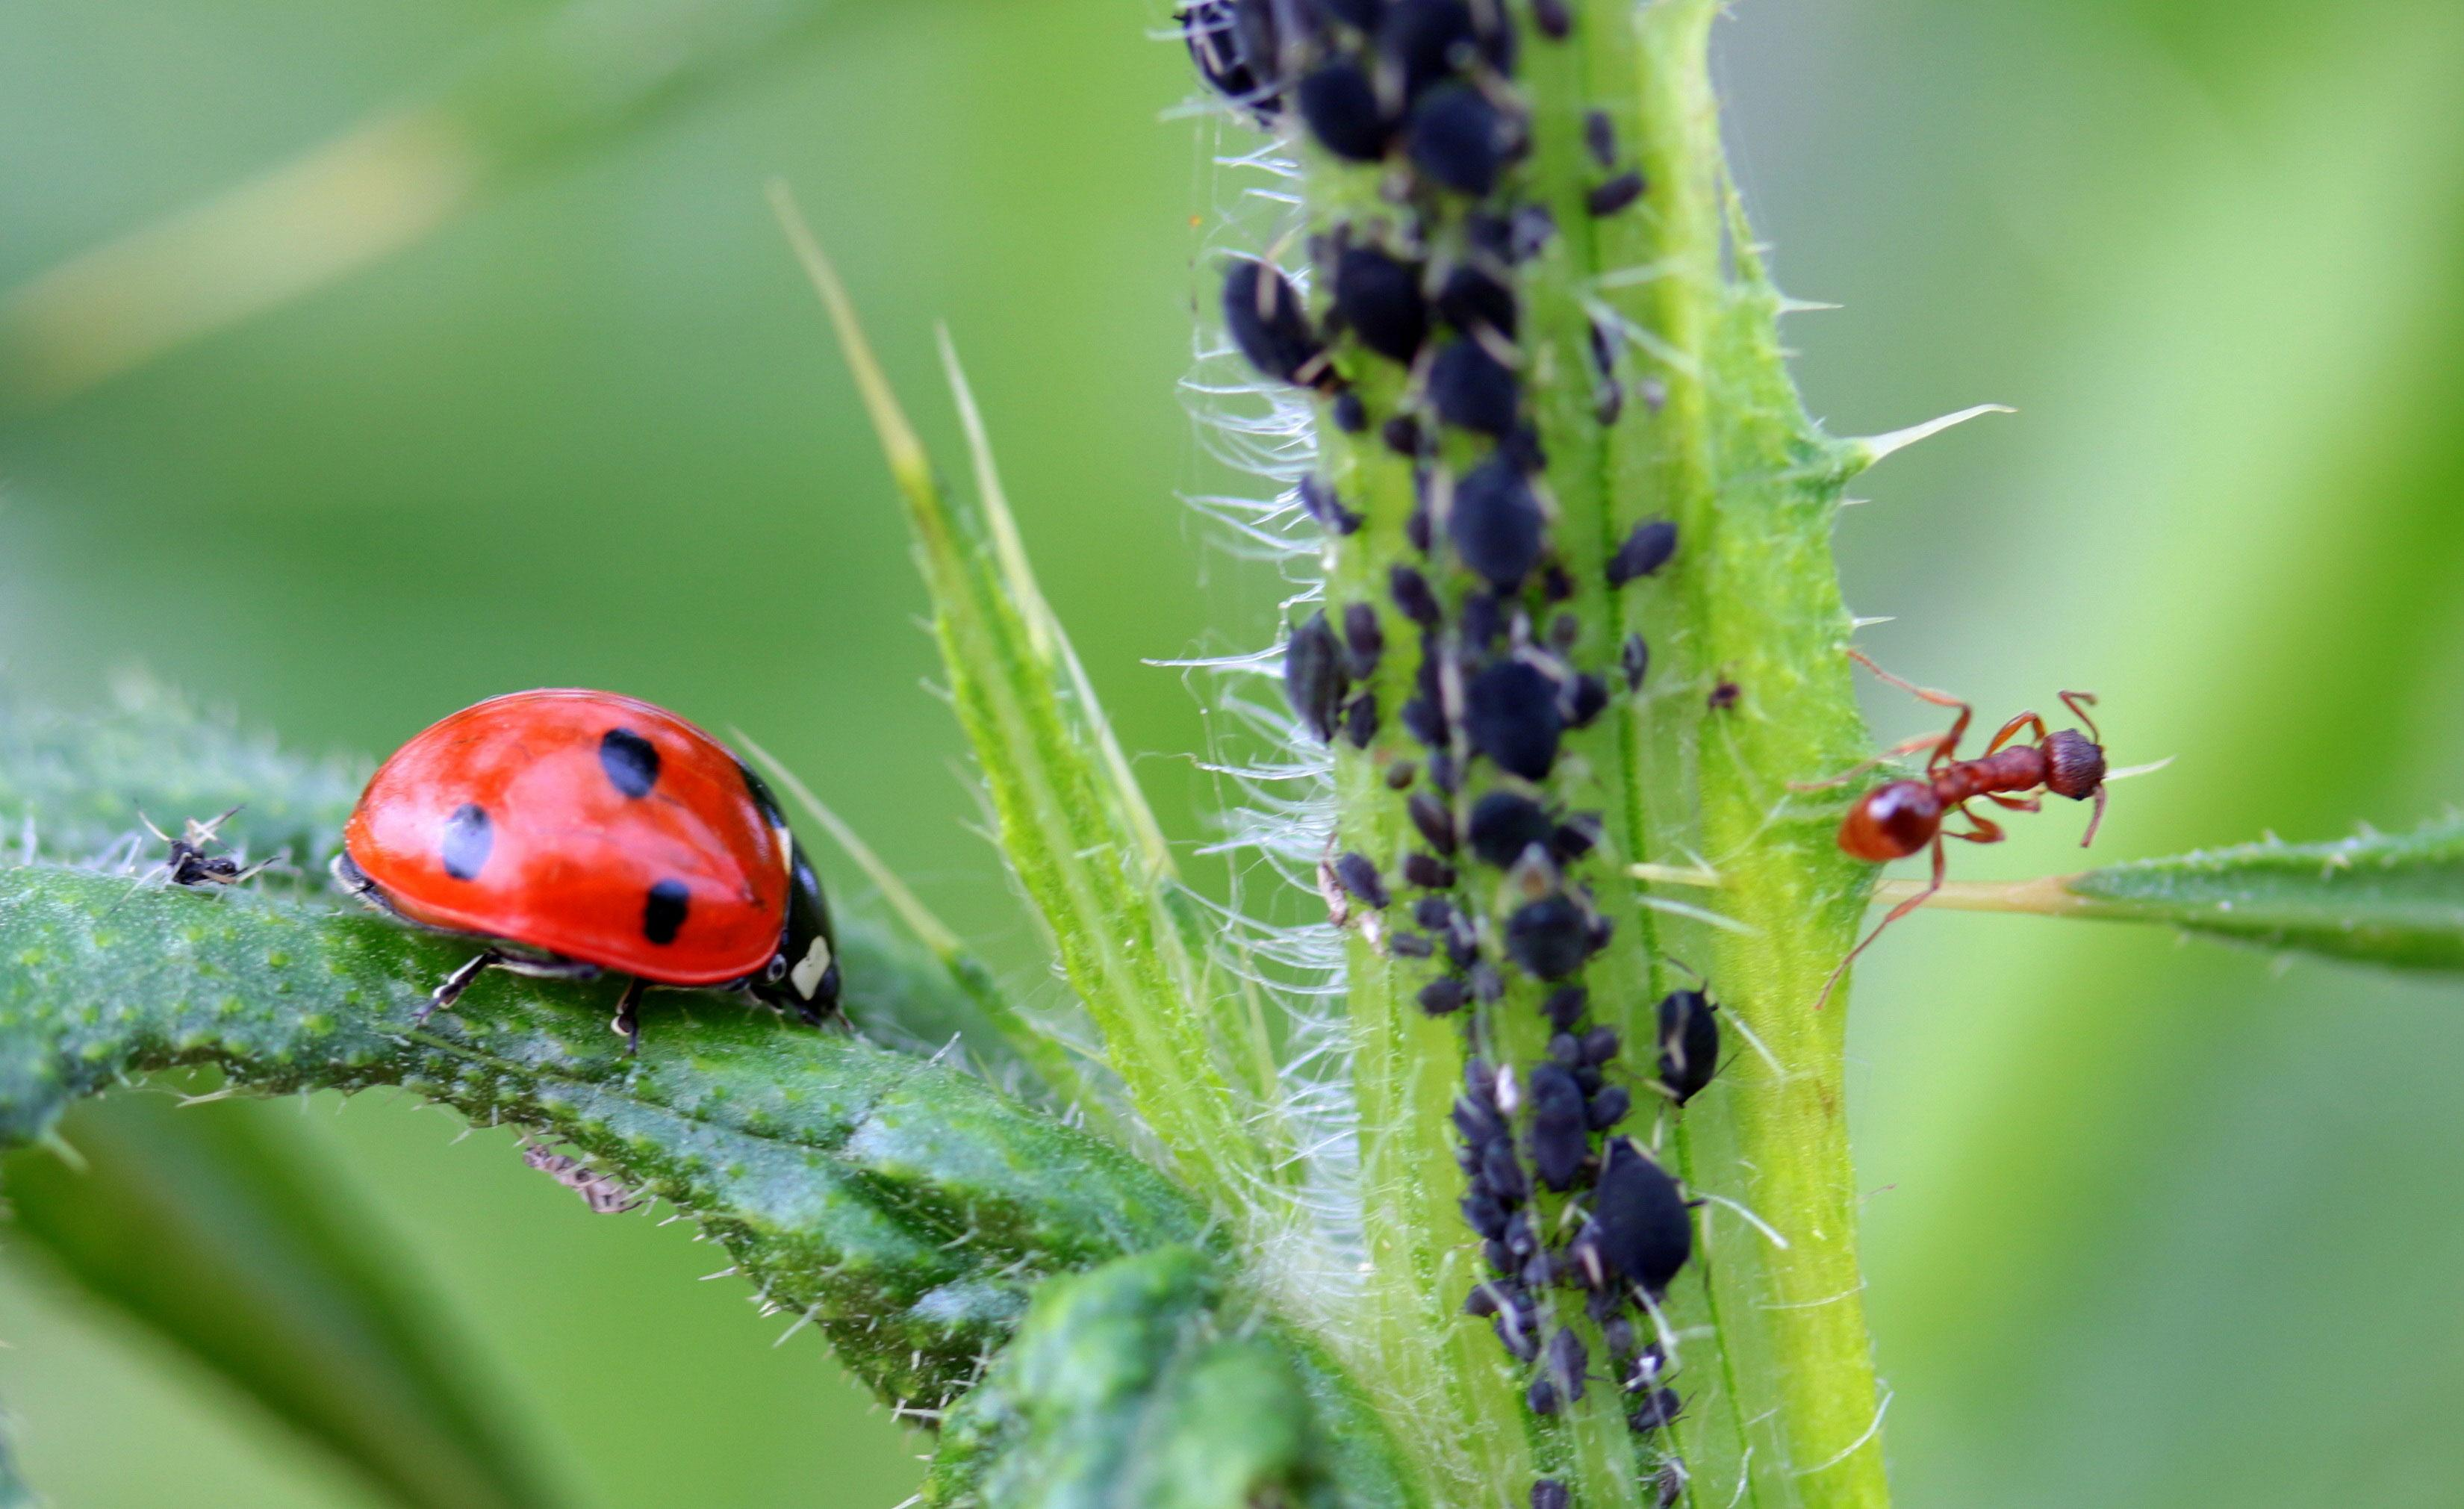 ladybug-1486479